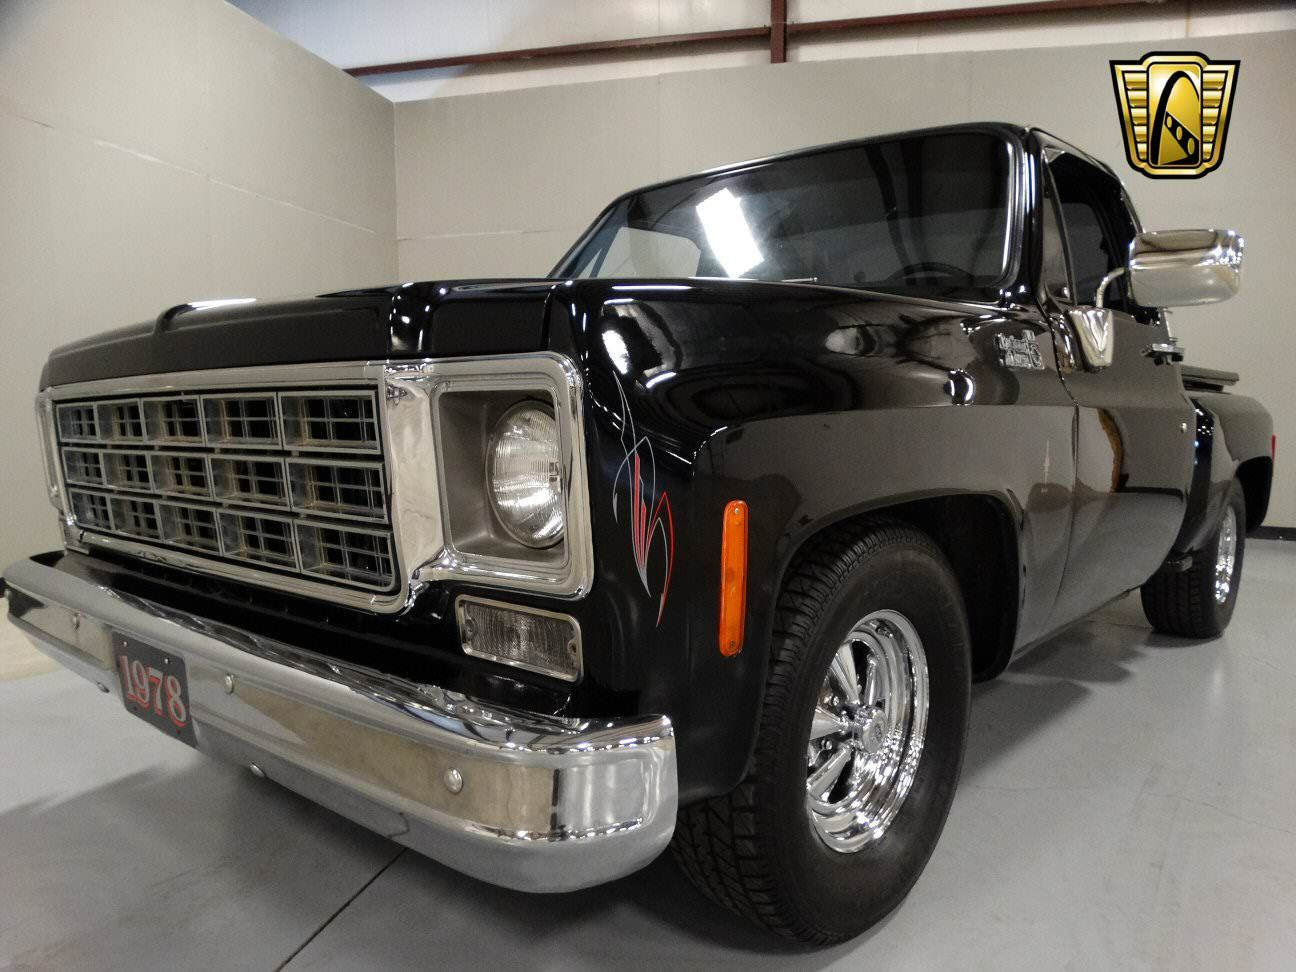 medium resolution of 1978 chevy c10 autotrader classics 1978 chevrolet c10 truck black 8 cylinder